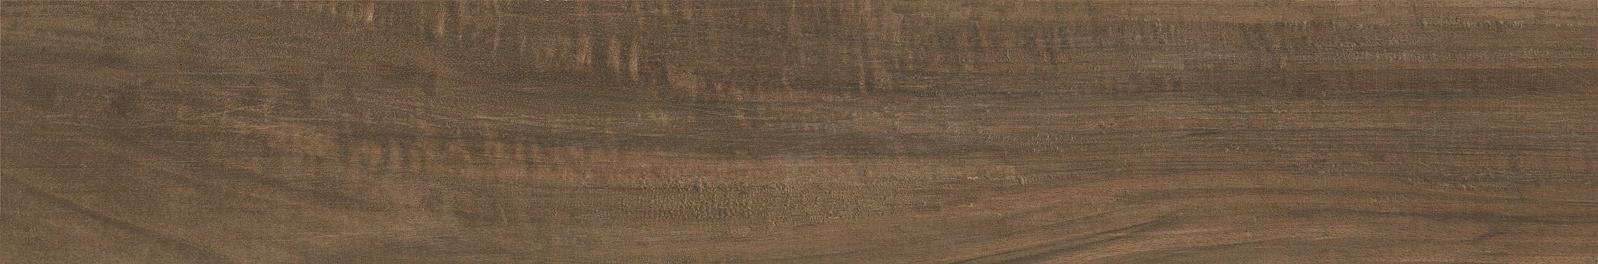 Купить Керамогранит Marazzi Ragno Woodstyle Noce R365 20x120, Италия